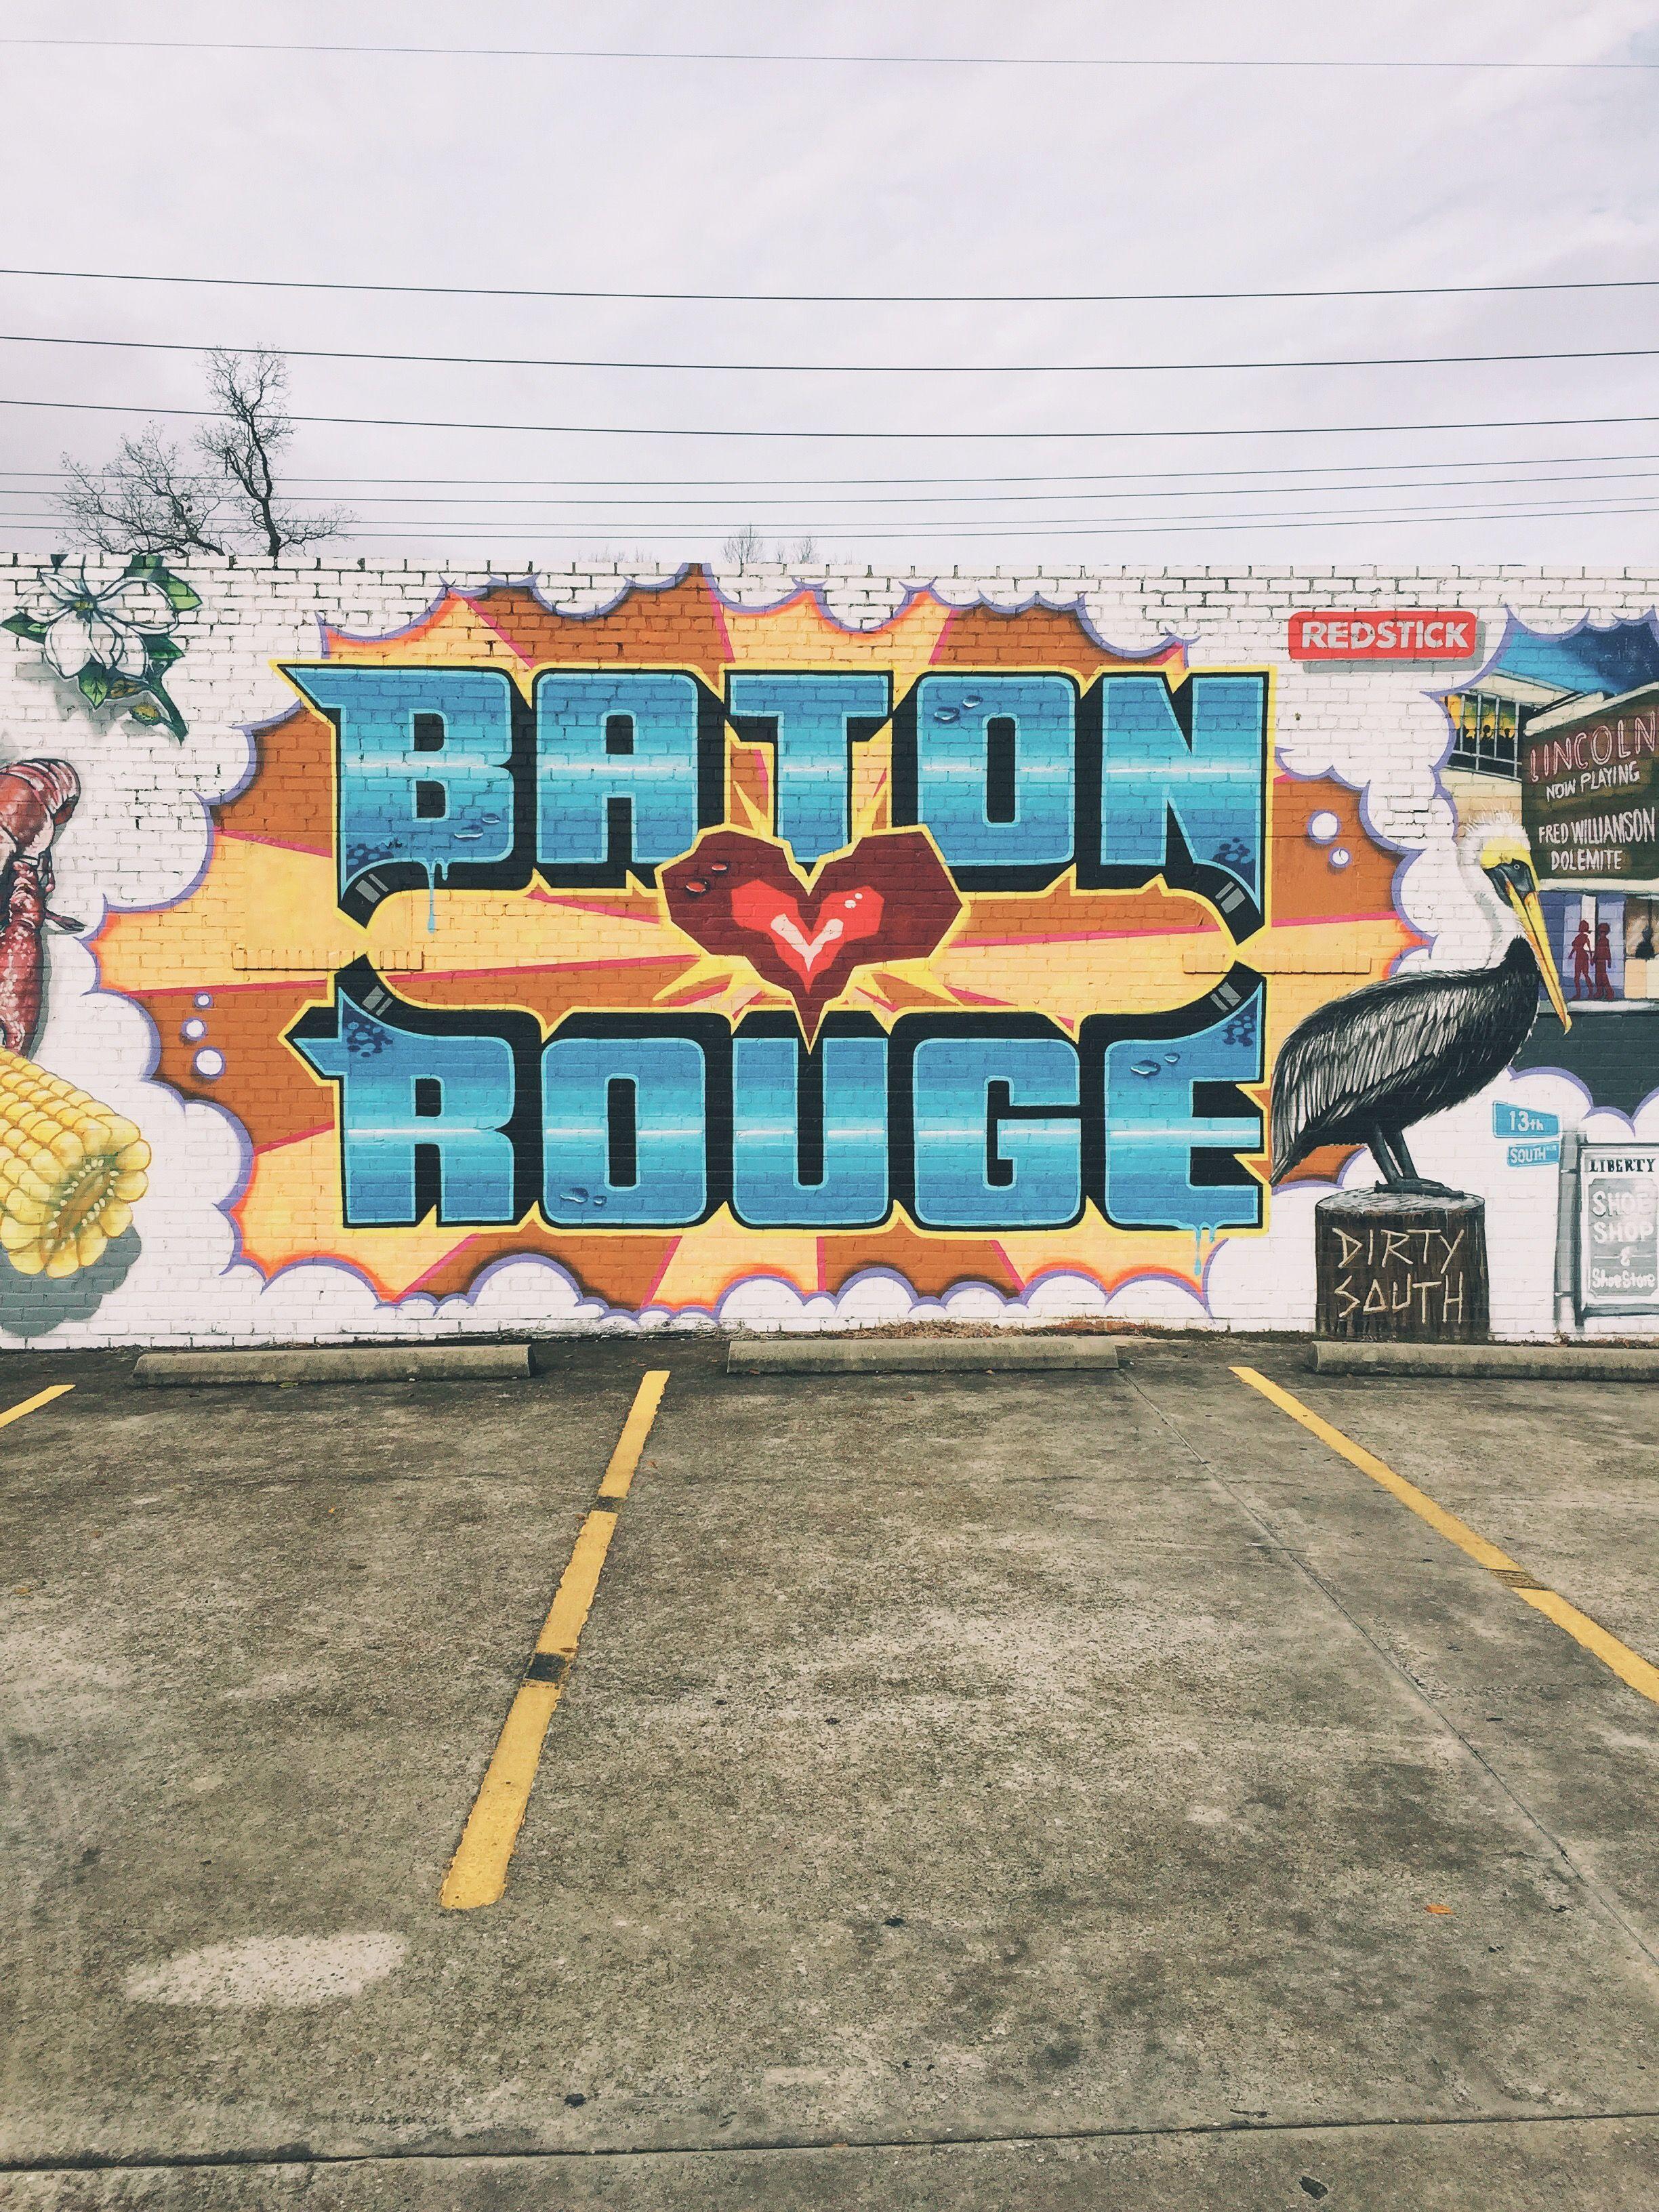 Redirecting baton rouge louisiana college college town